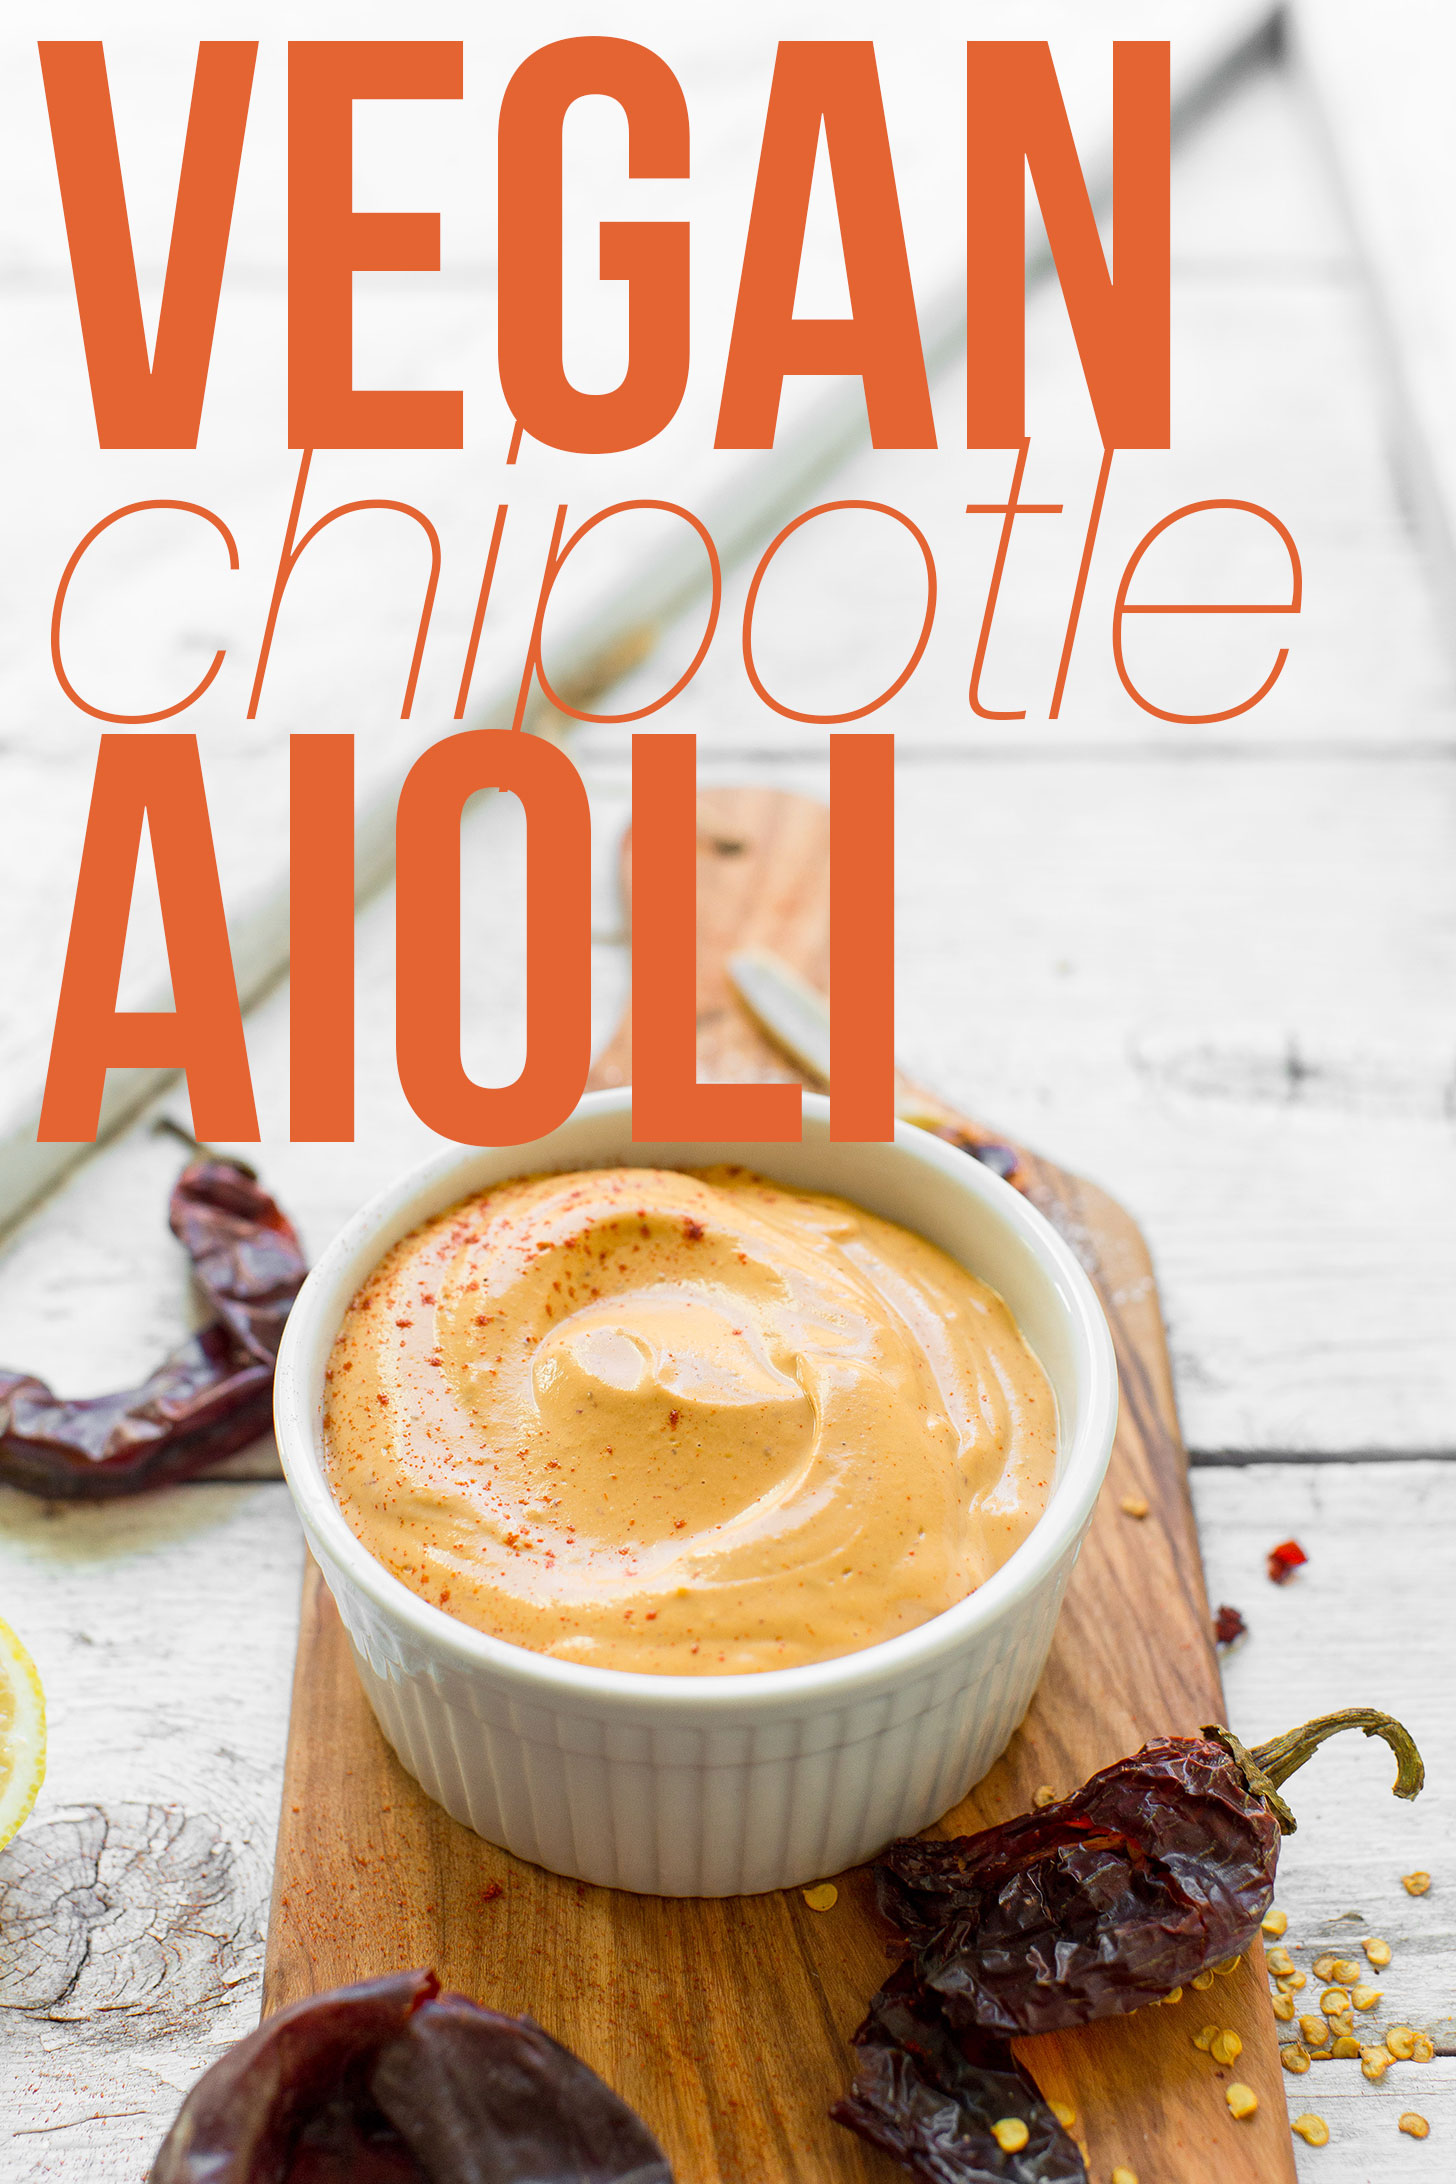 Bowl of homemade spicy vegan chipotle aioli